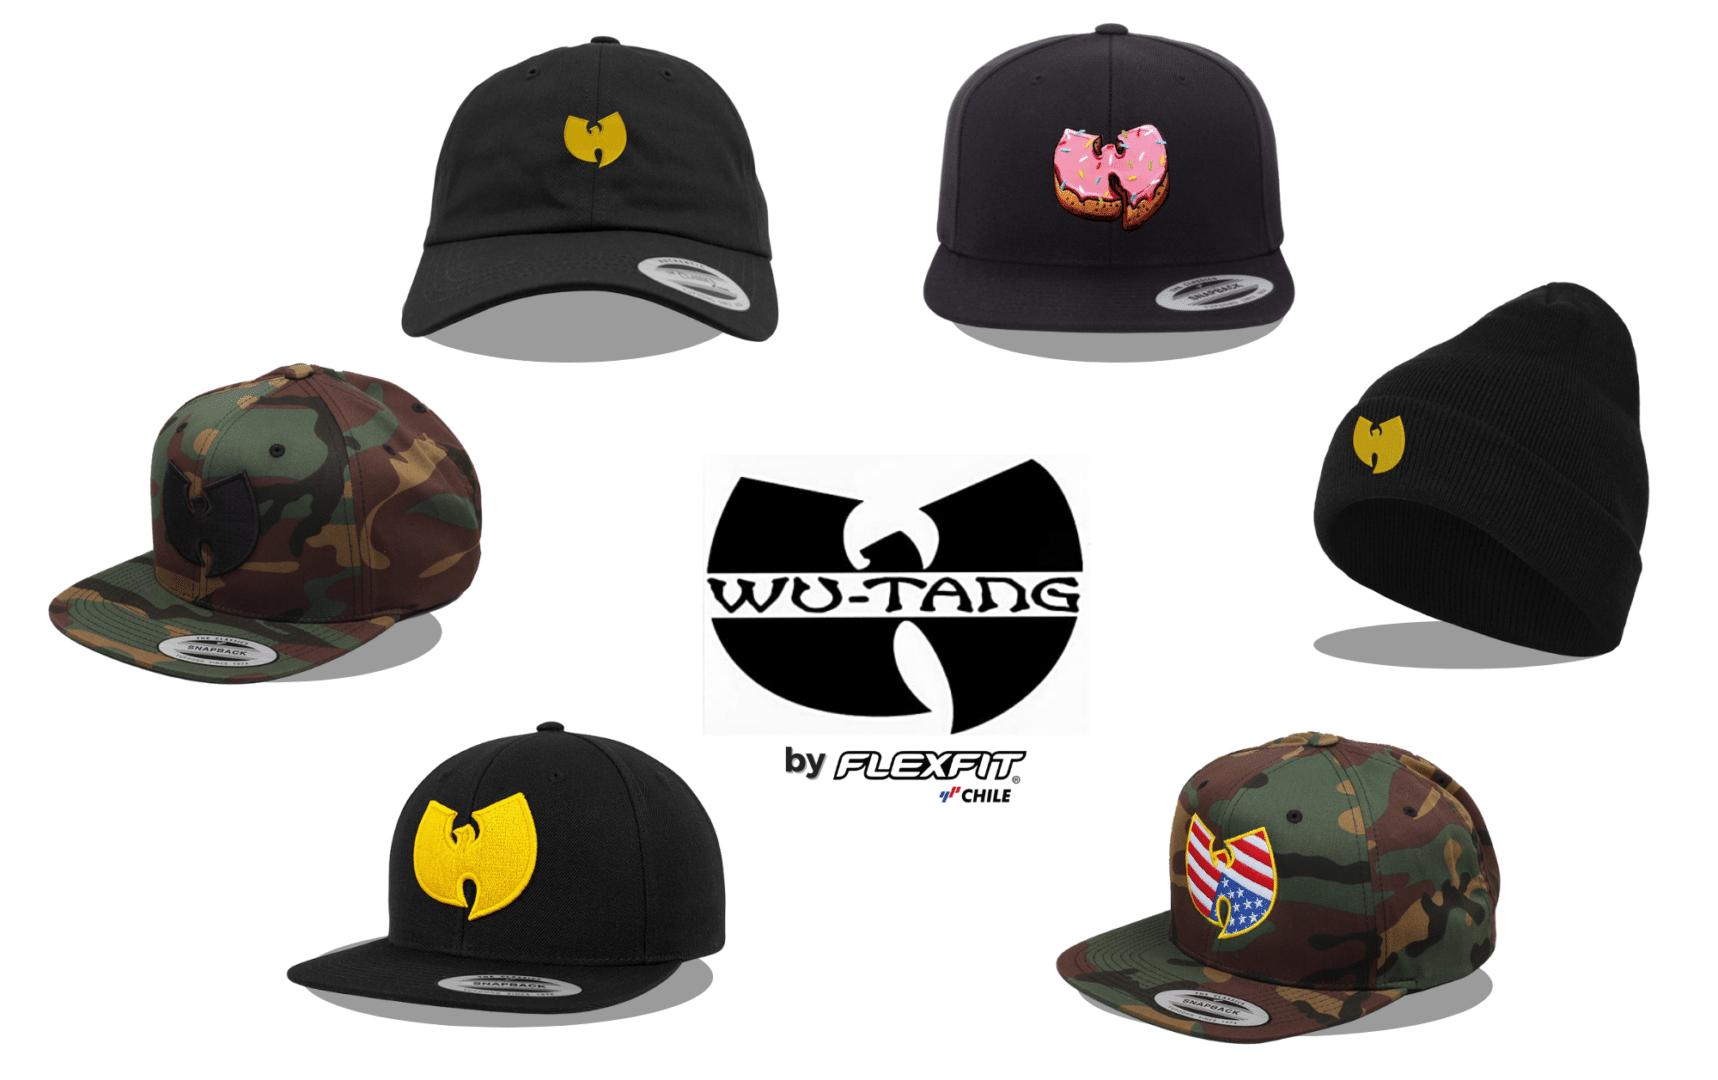 Colección Wu-Tang Clan Flexfit Chile